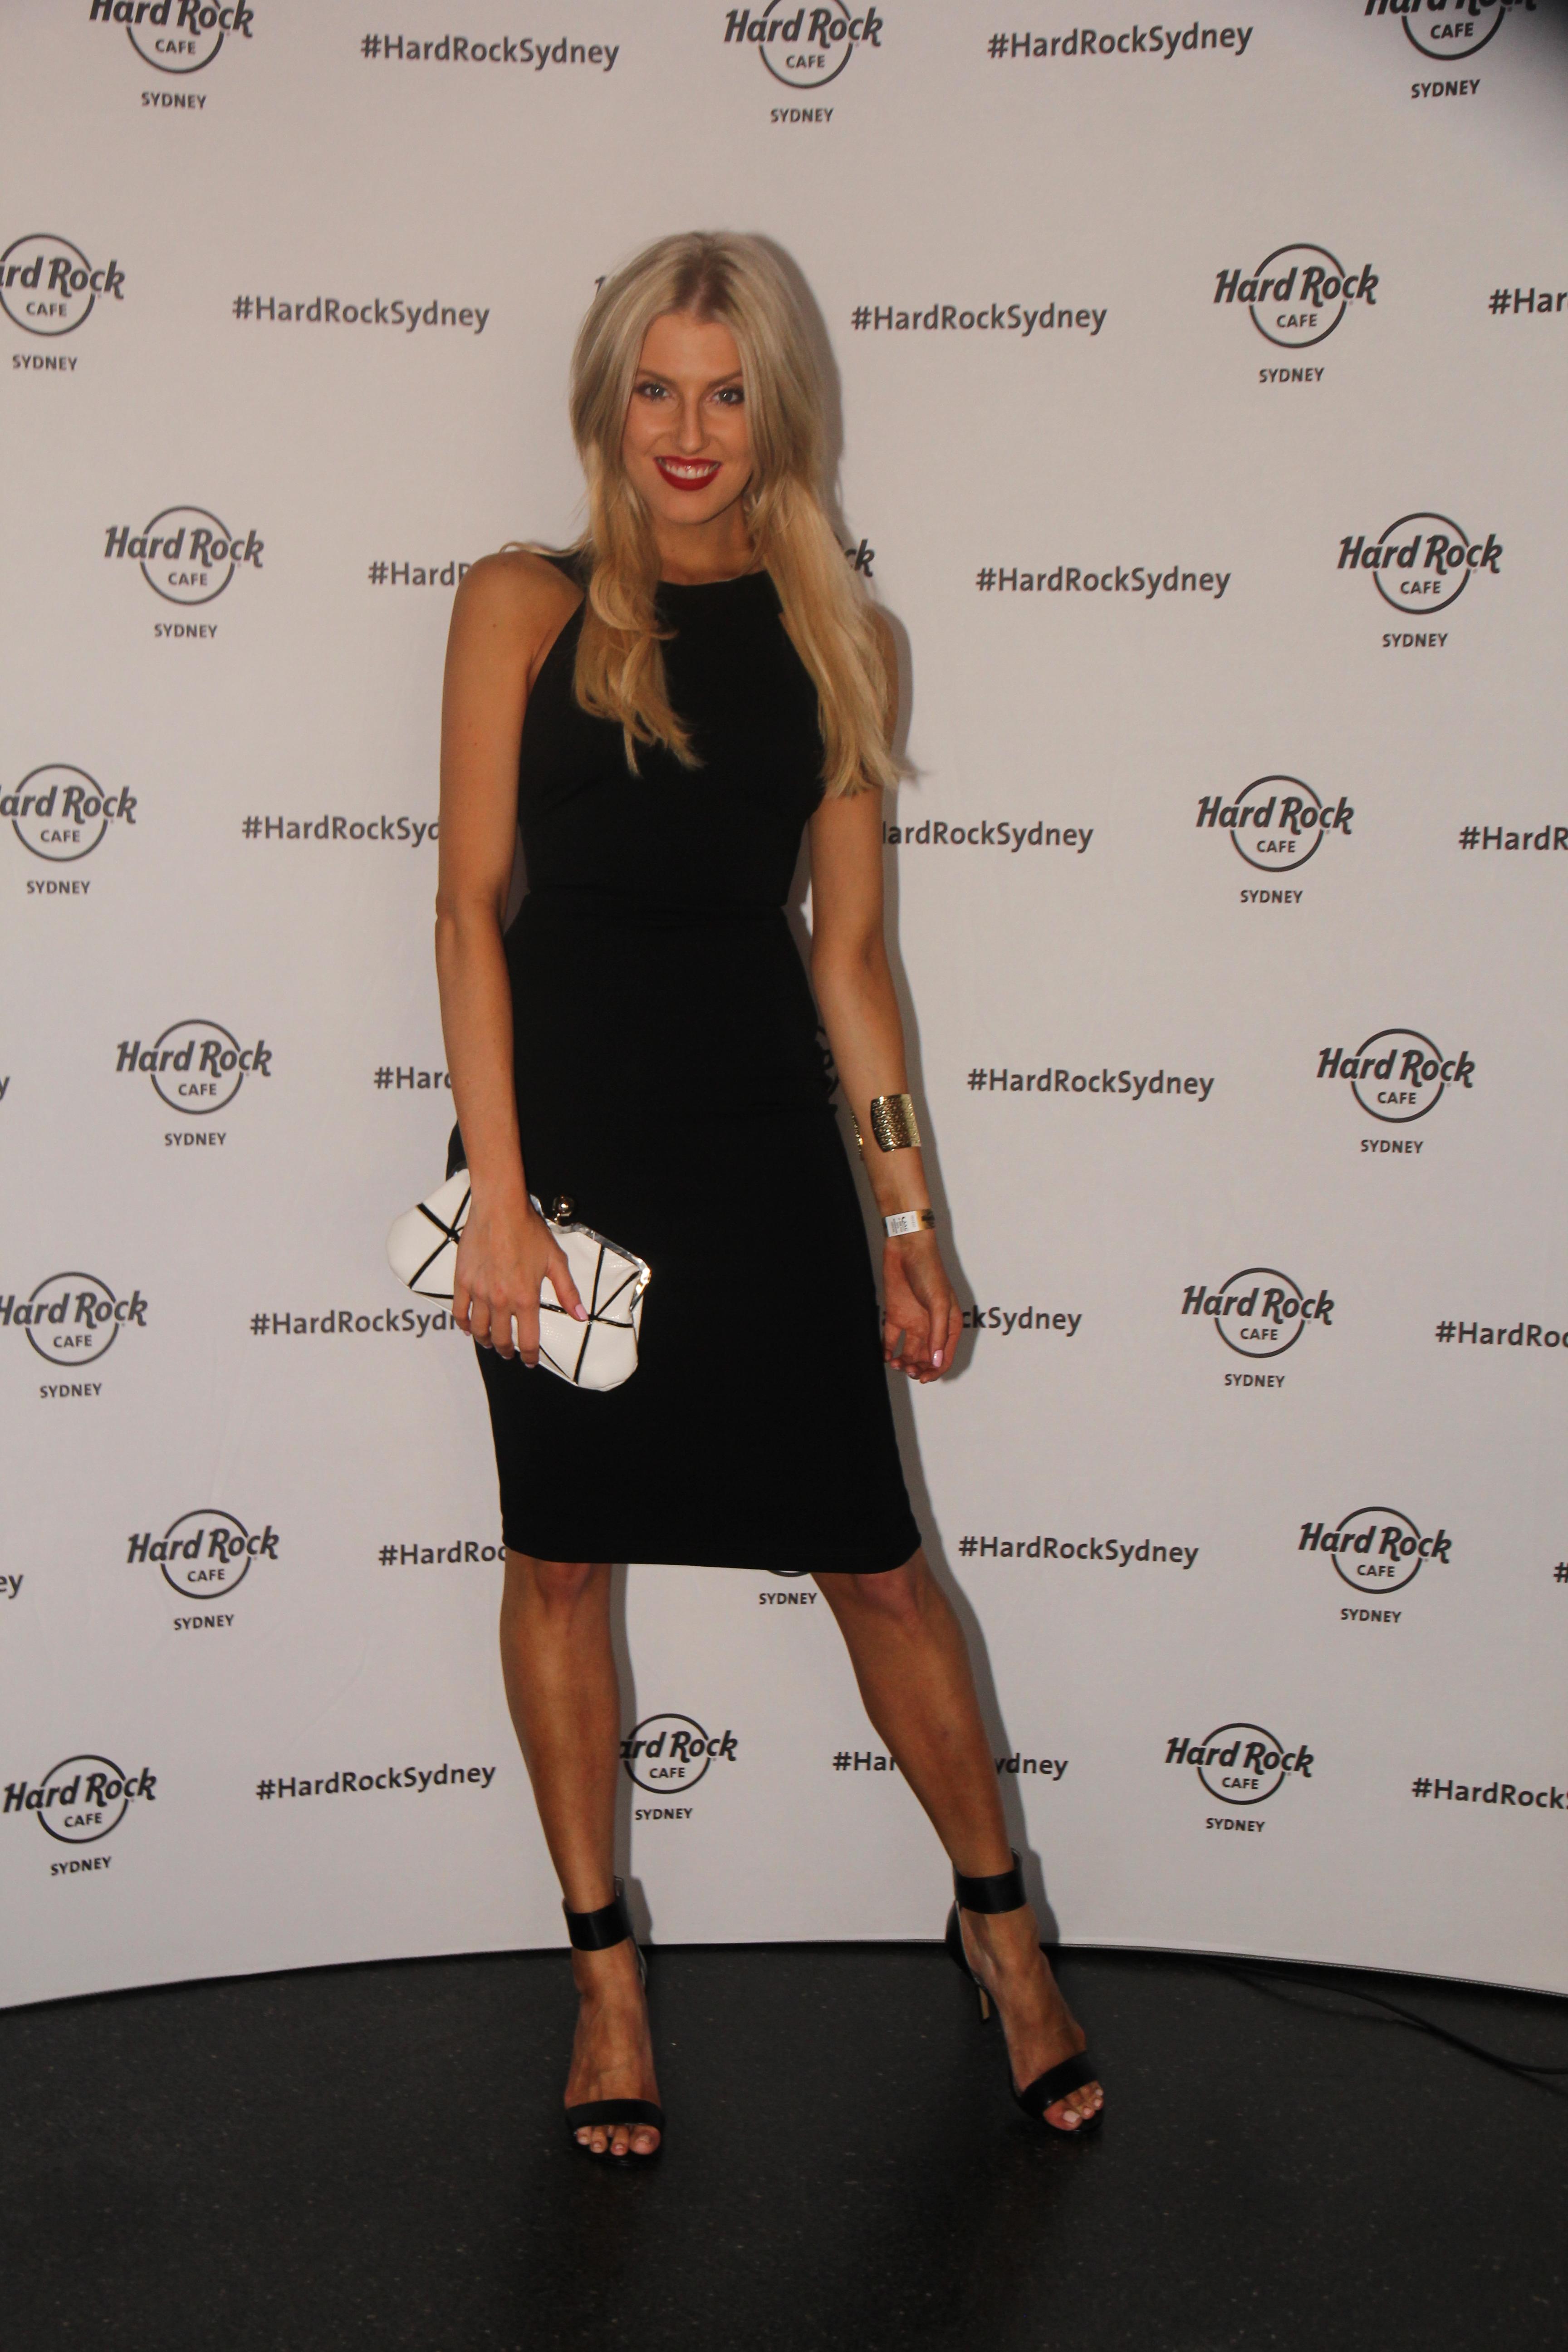 Hard Rock Cafe Sydney Dress Code